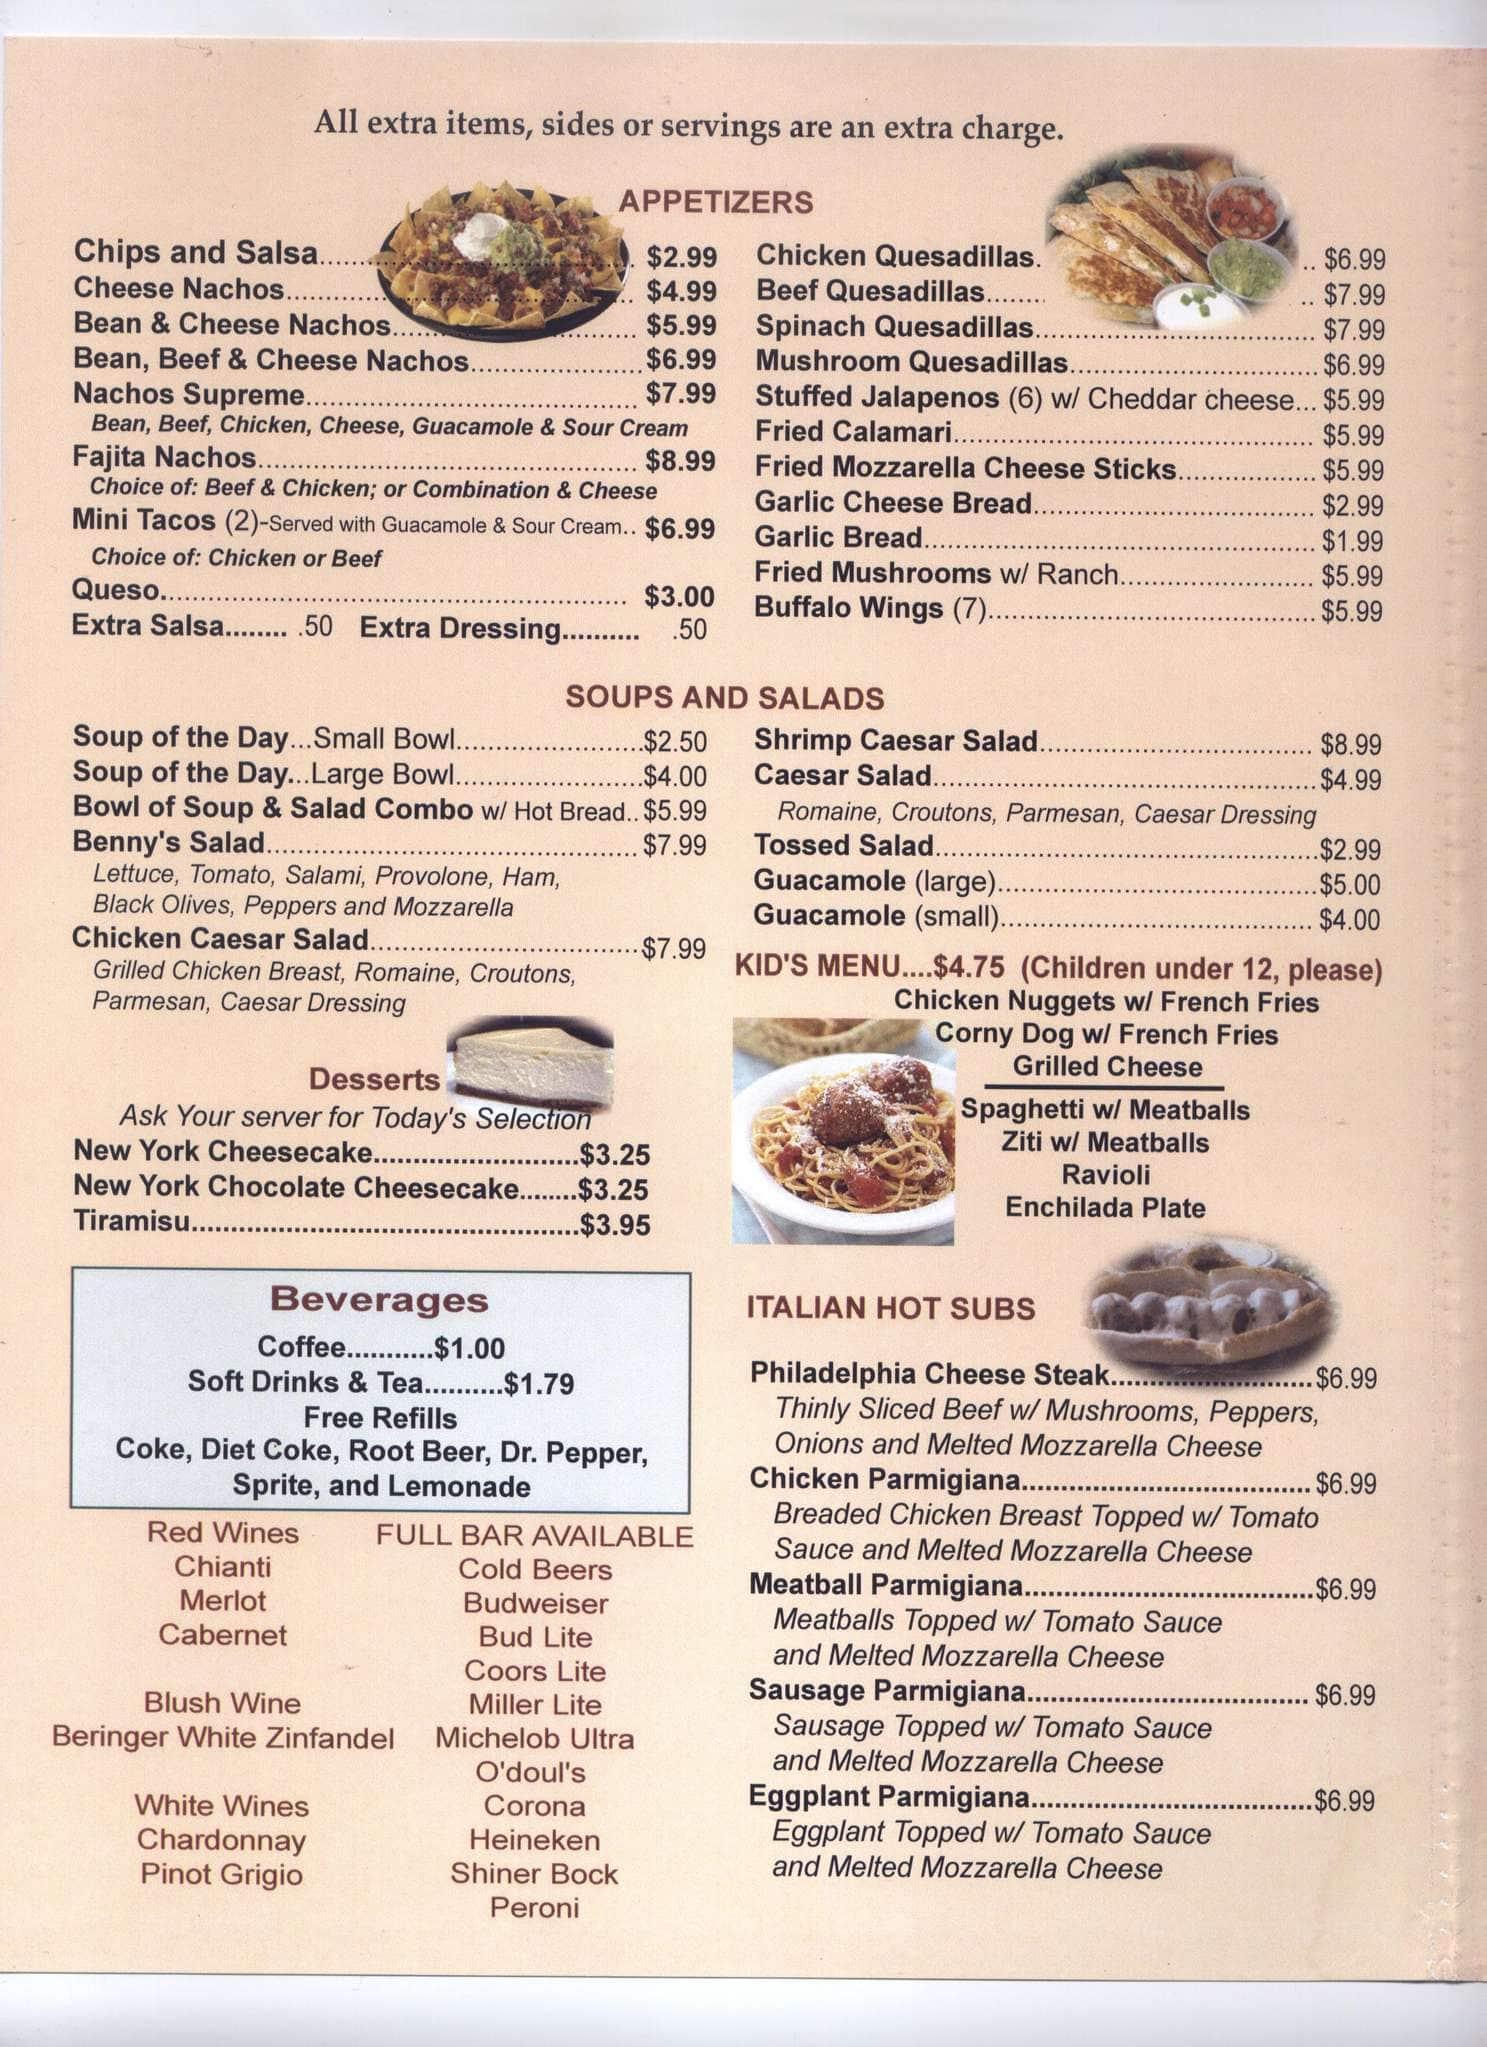 benny joe's menu, menu for benny joe's, alvarado, alvarado